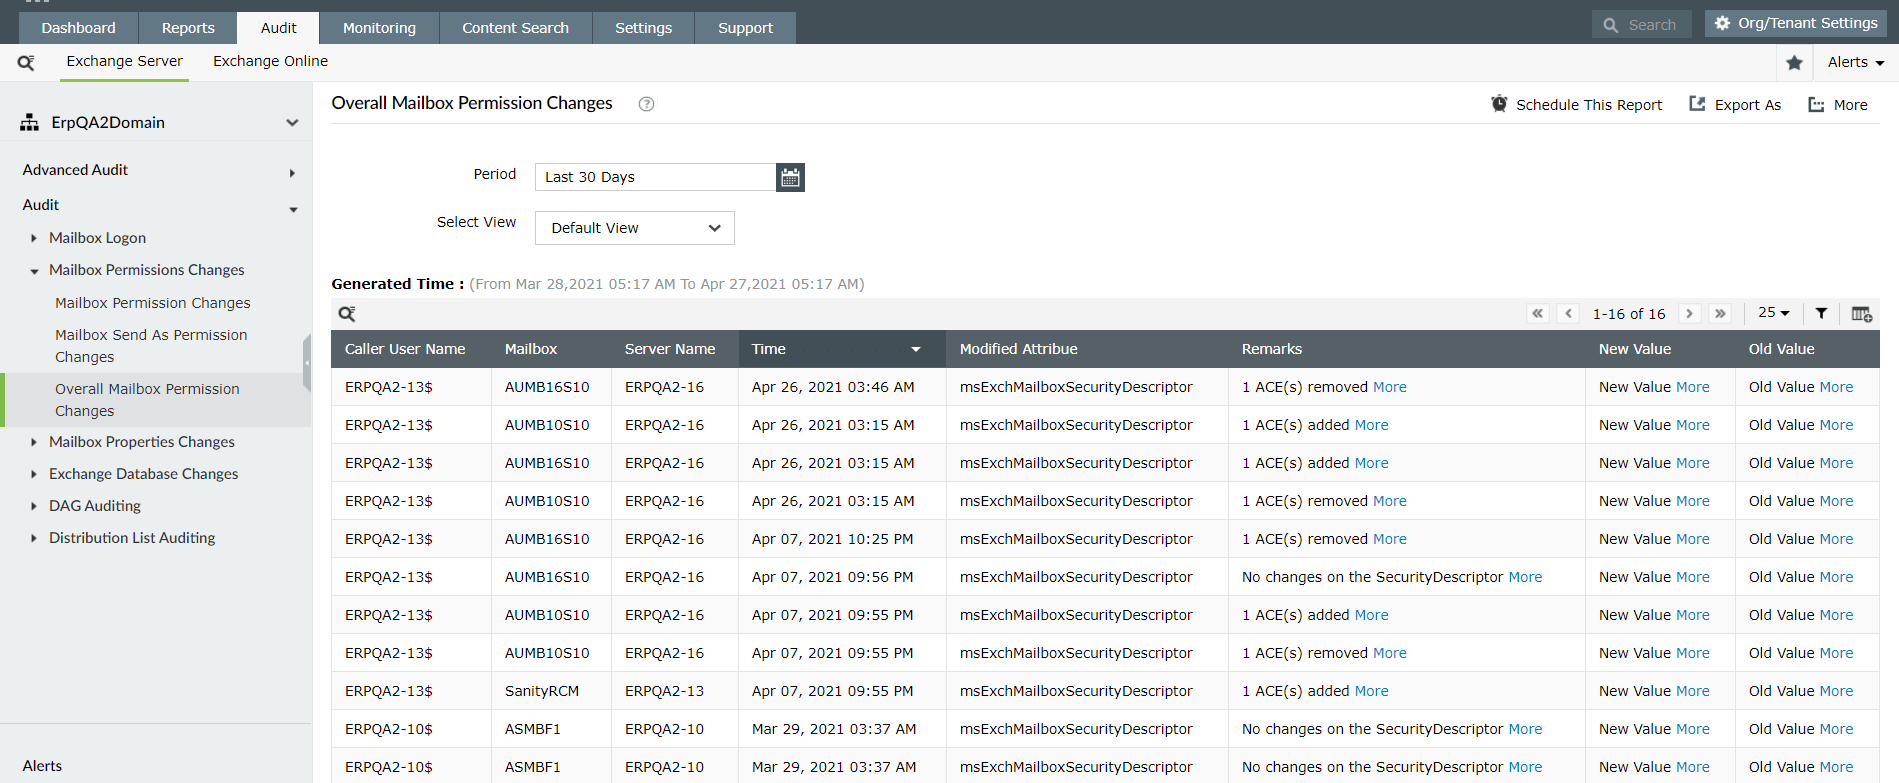 Exchange Online mailbox permission changes